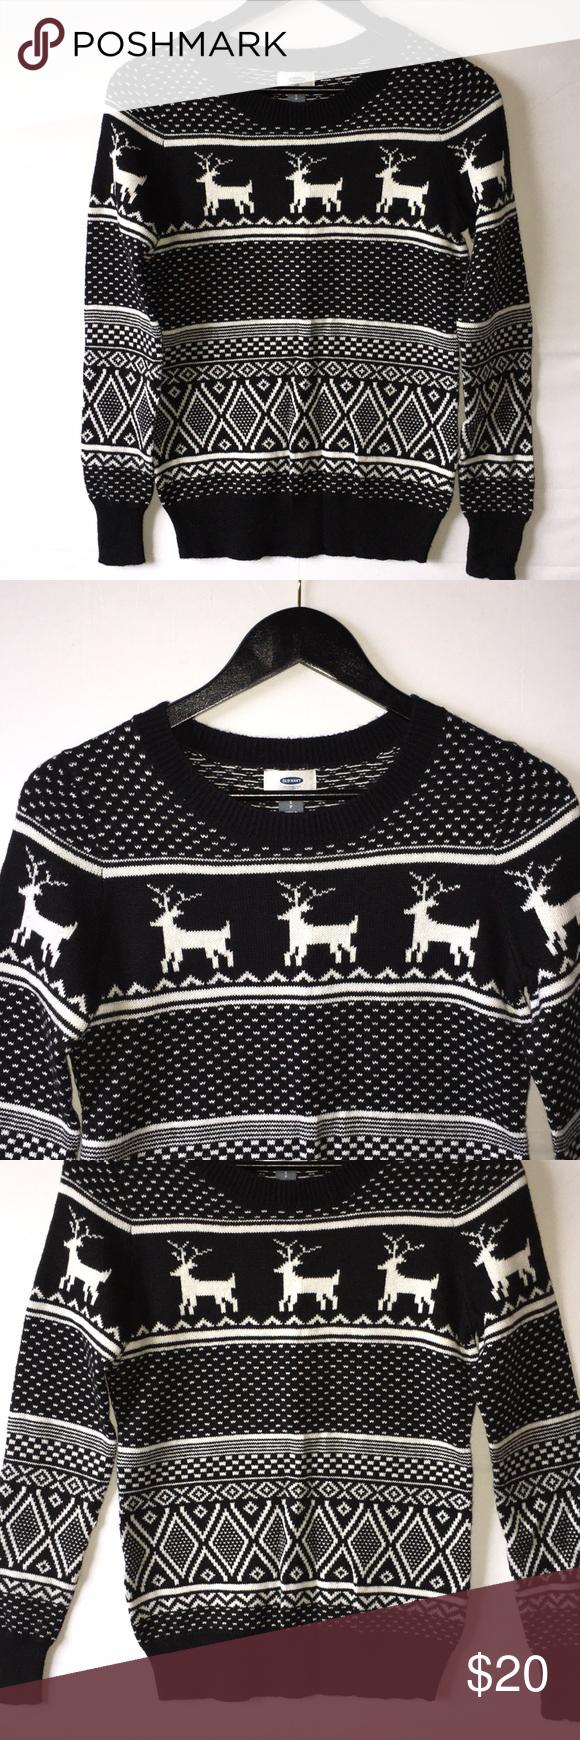 Womens Old Navy Holiday Christmas Sweater My Posh Picks